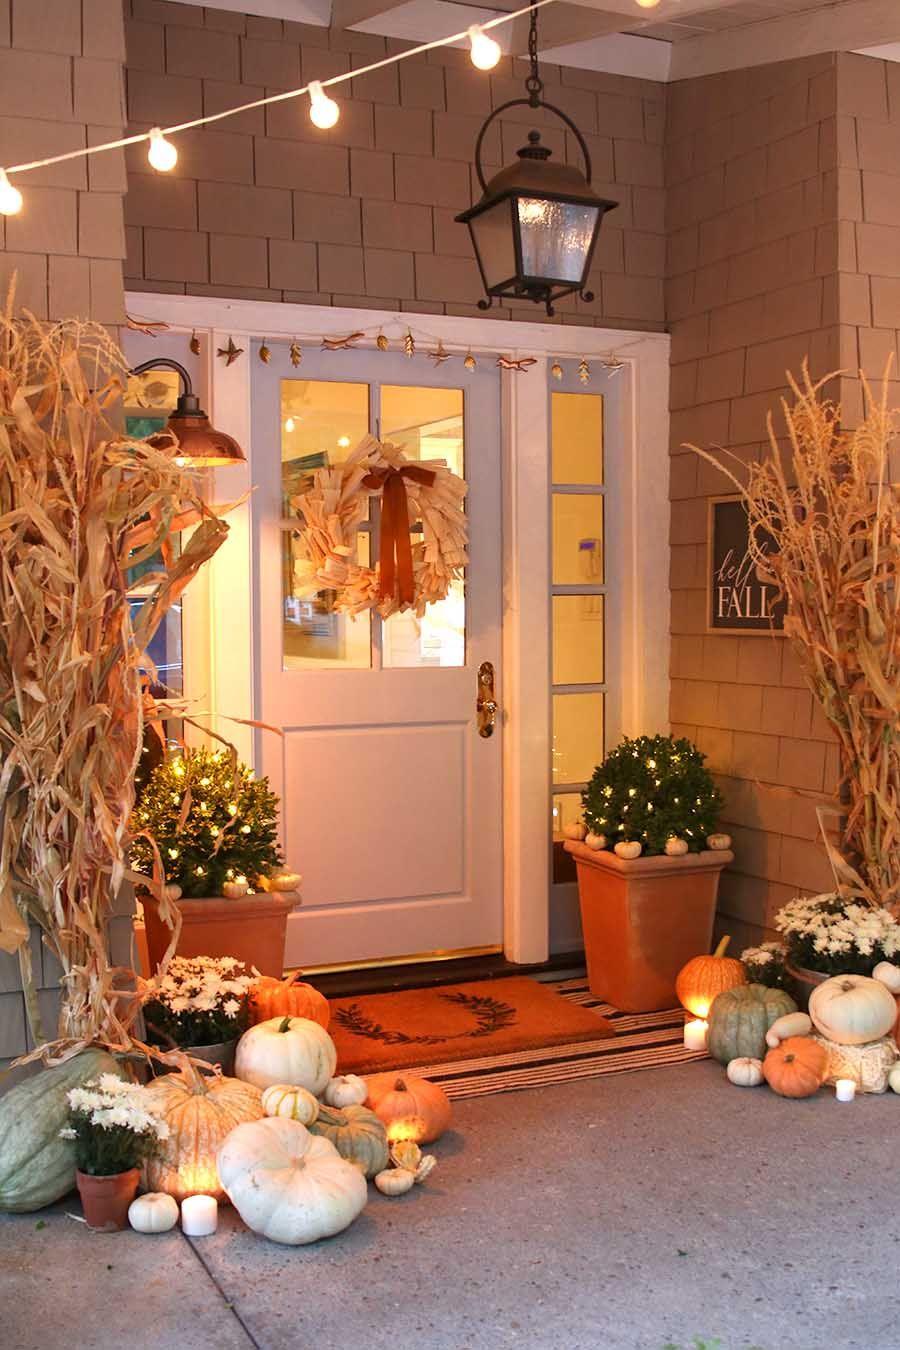 Neutral Fall Porch Decor with Pumpkins and Cornstalks - Modern Glam